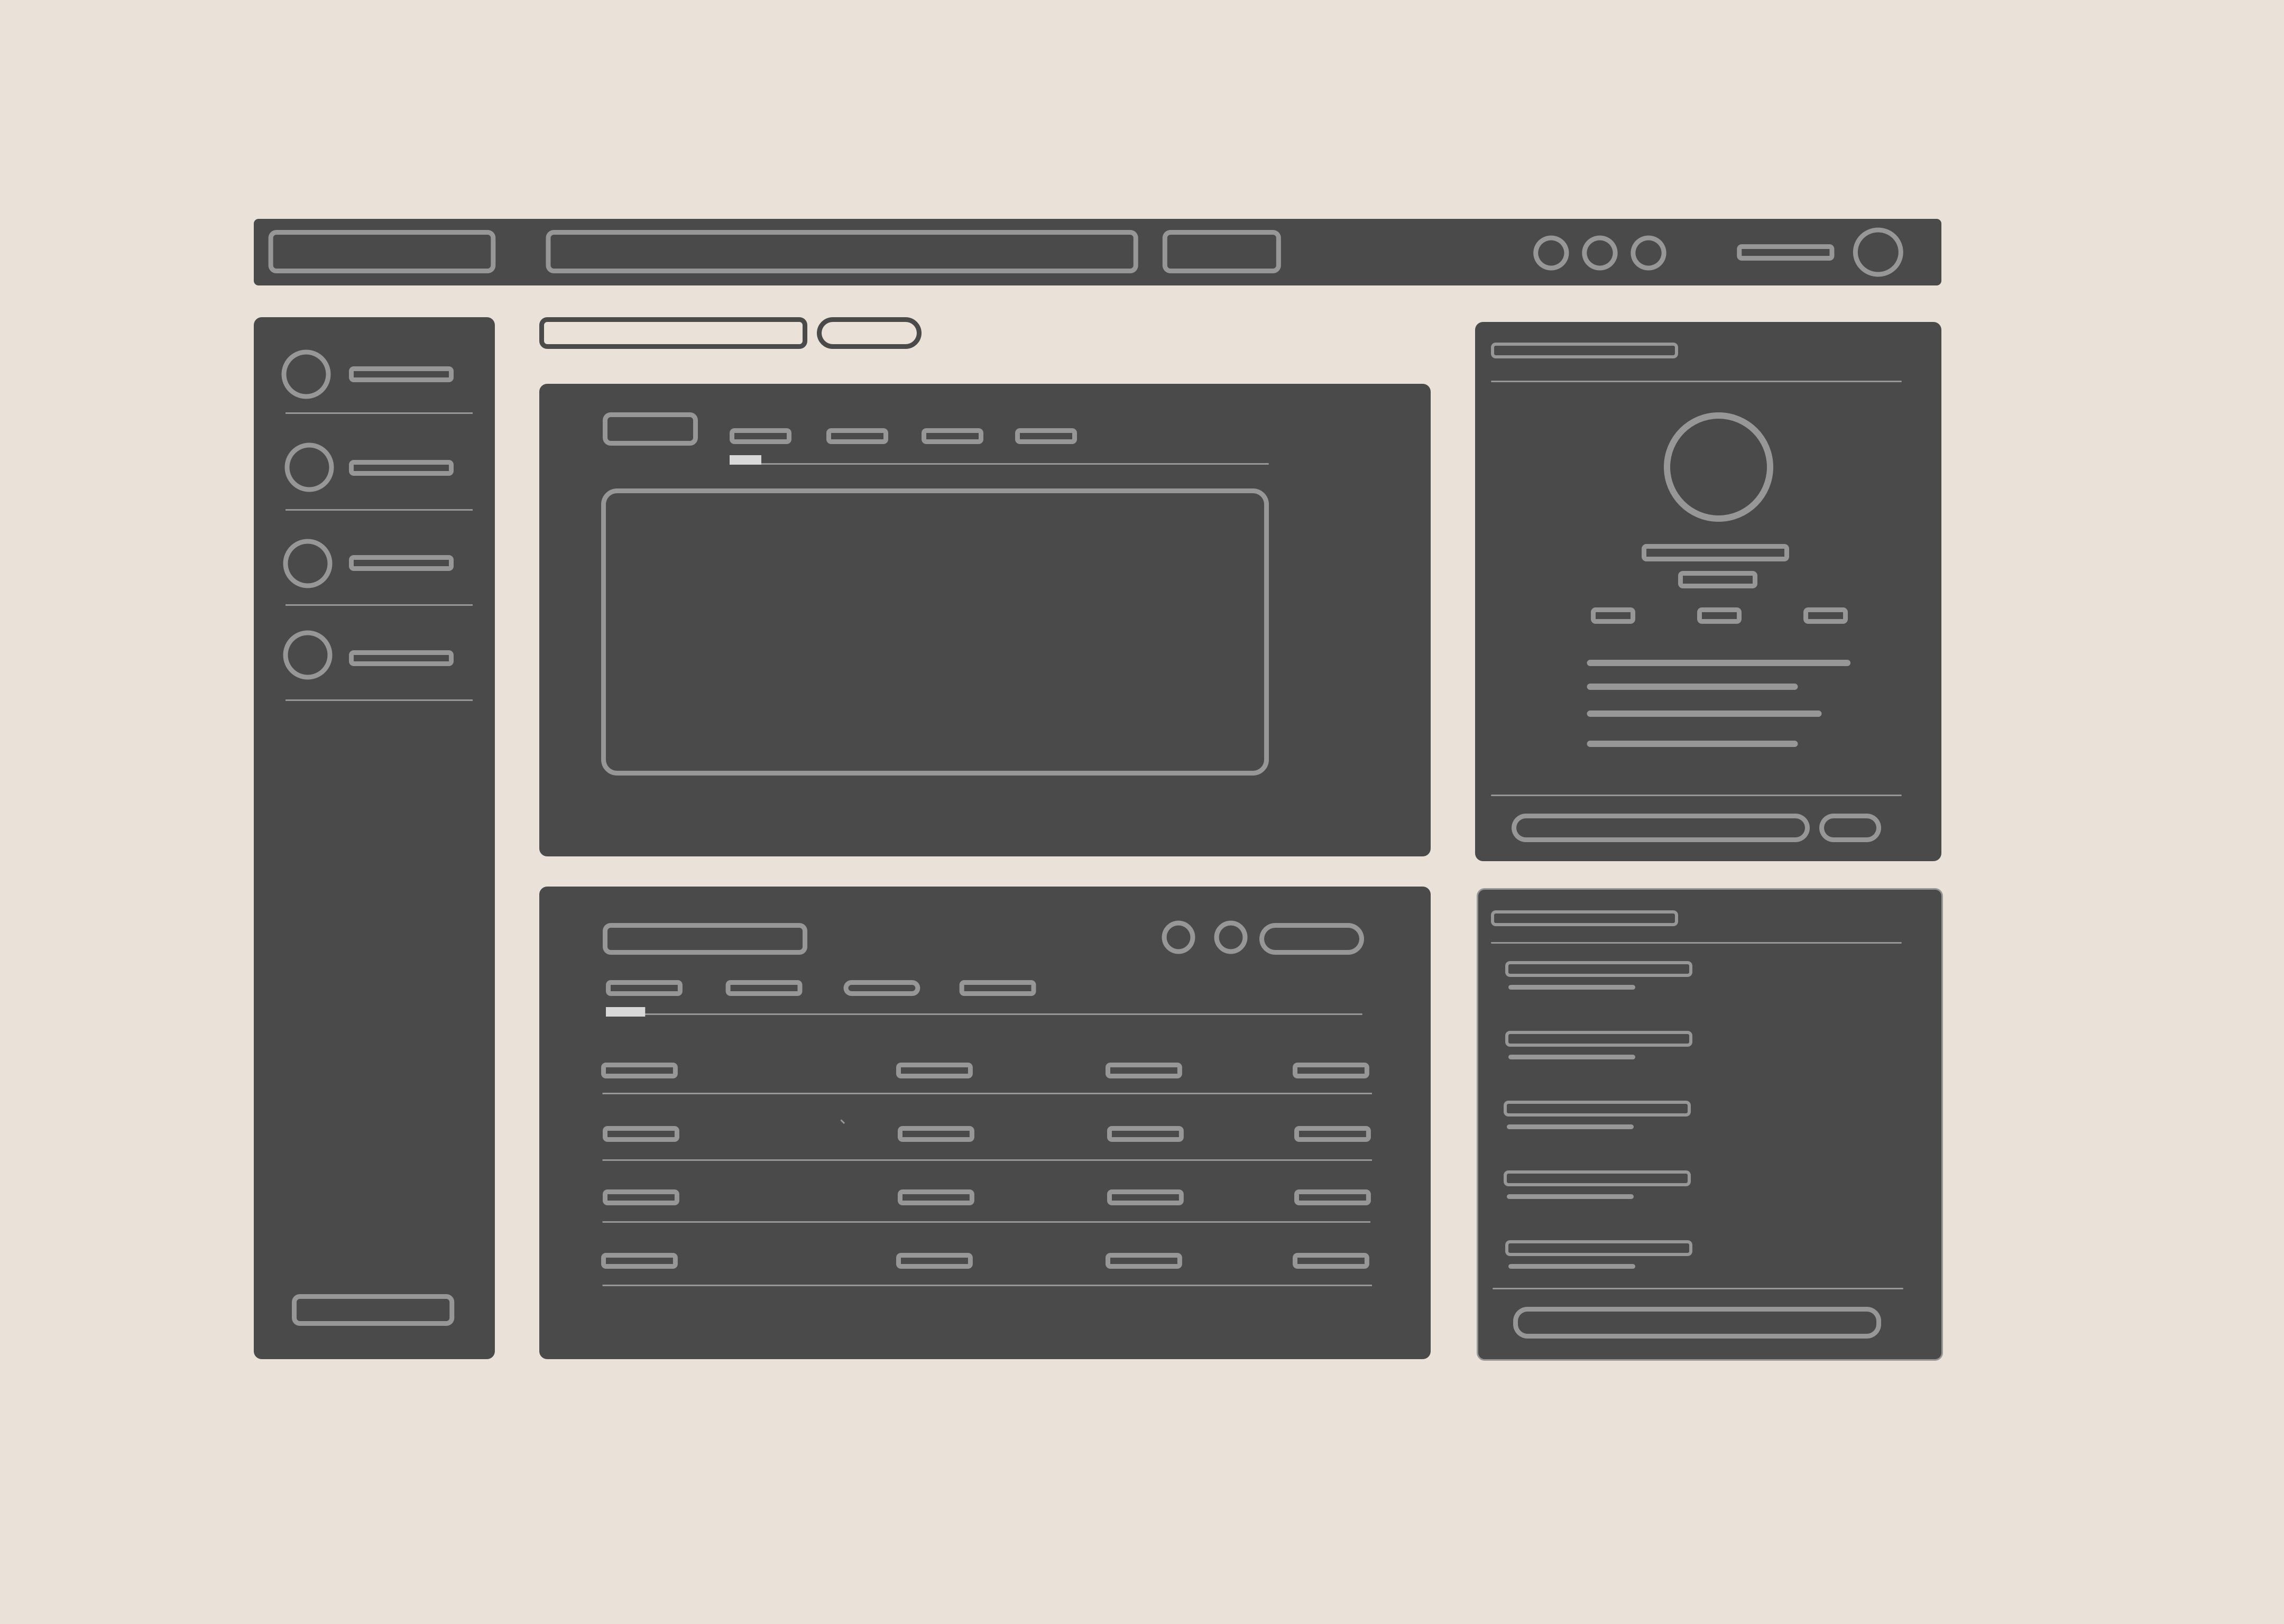 Dashboard_Inventory_Wireframe_hifi